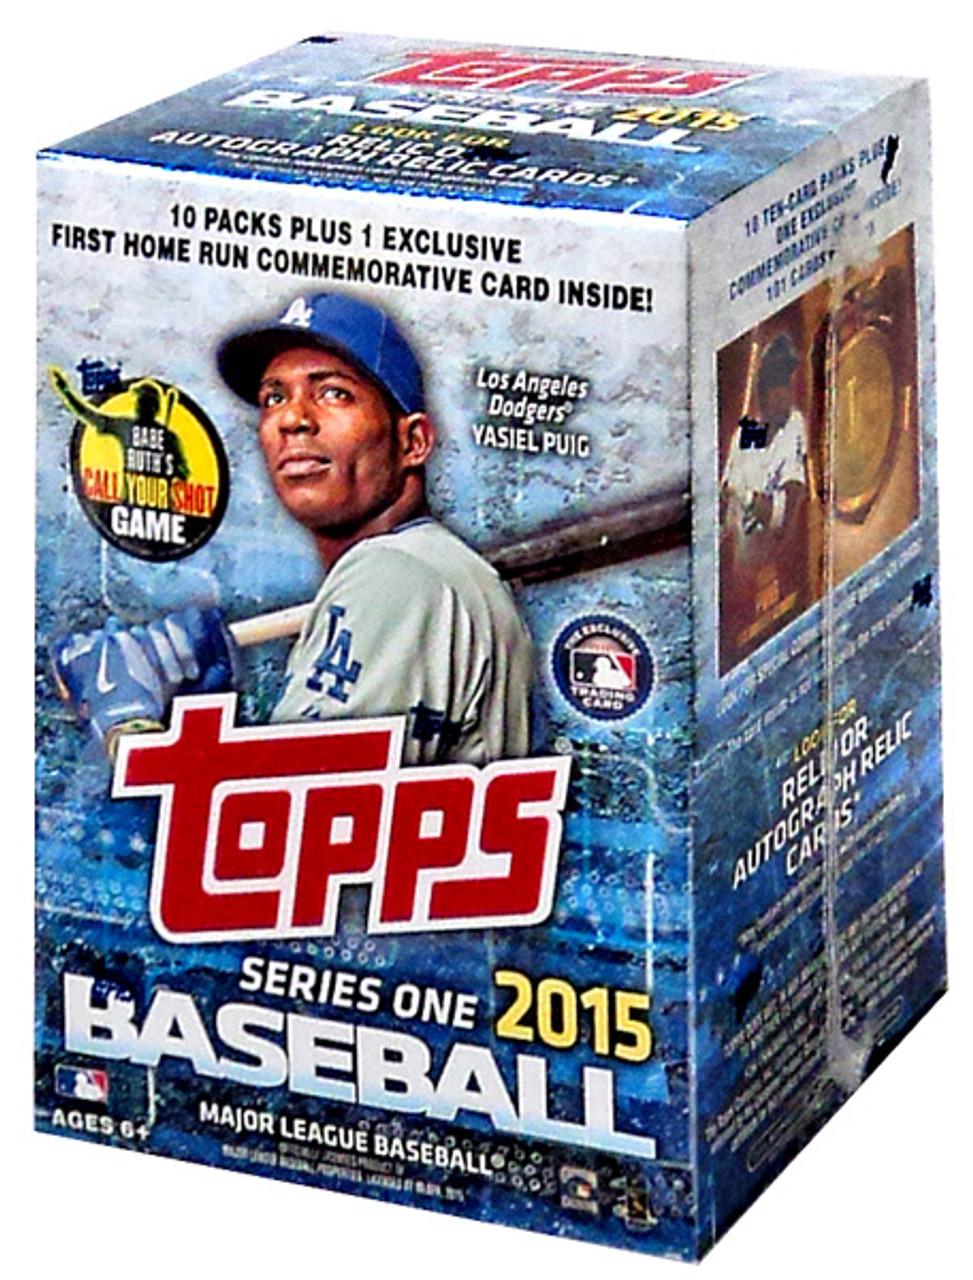 Mlb 2015 Series 1 Baseball Trading Card Blaster Box 10 Packs